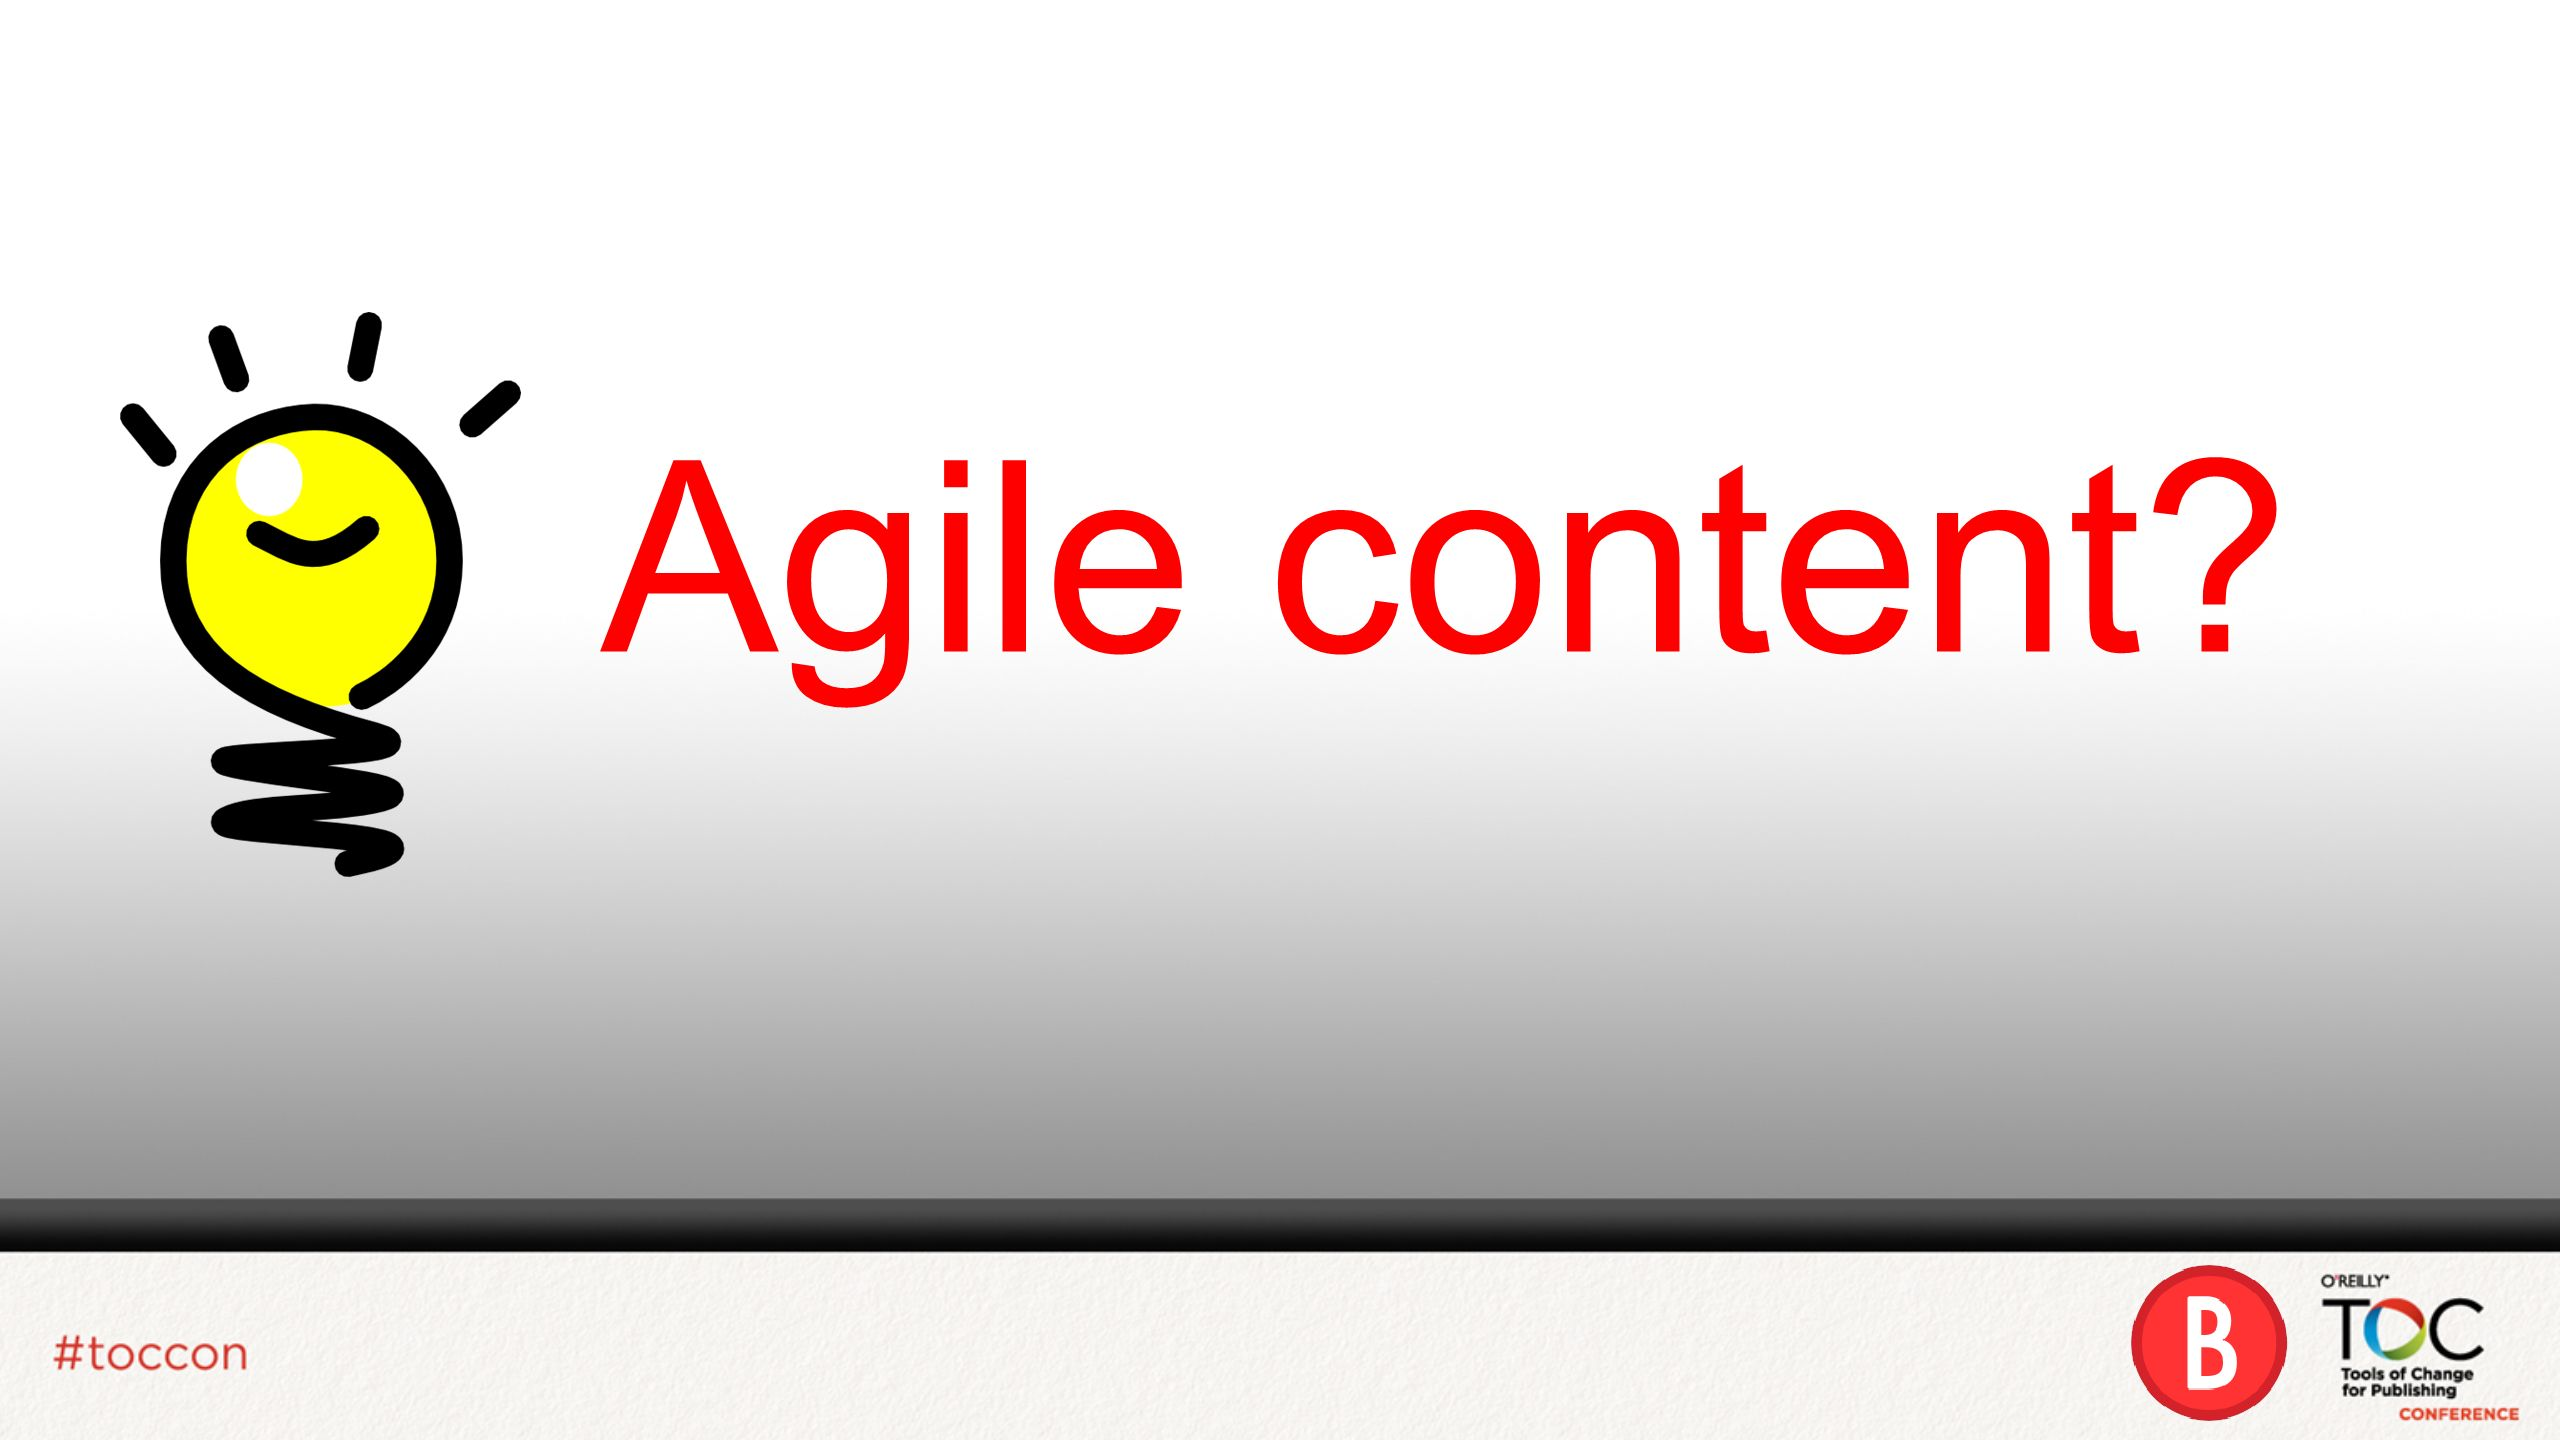 Agile content?